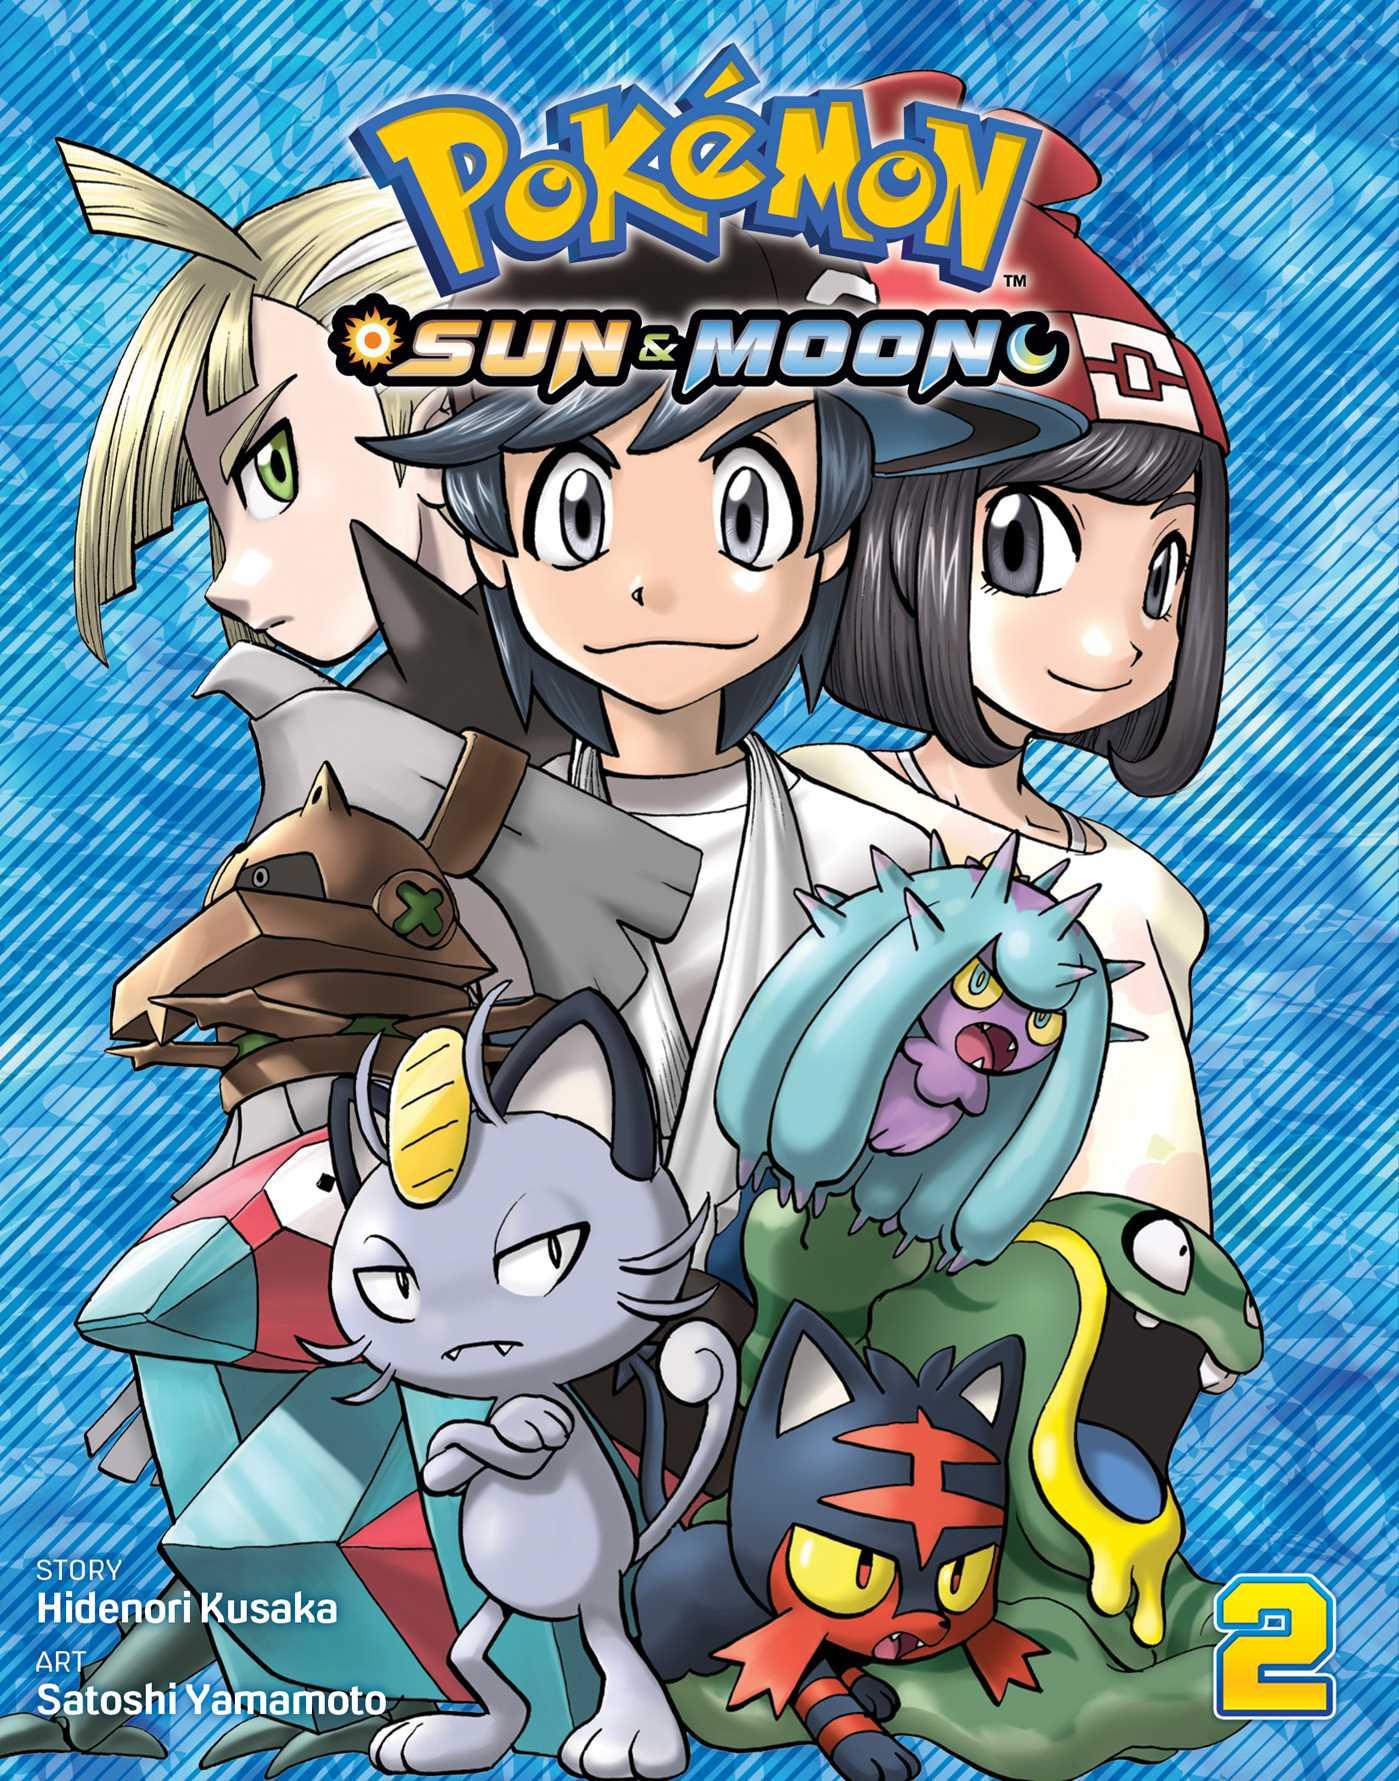 Pokemon sun moon vol 2 9781974701308 hr